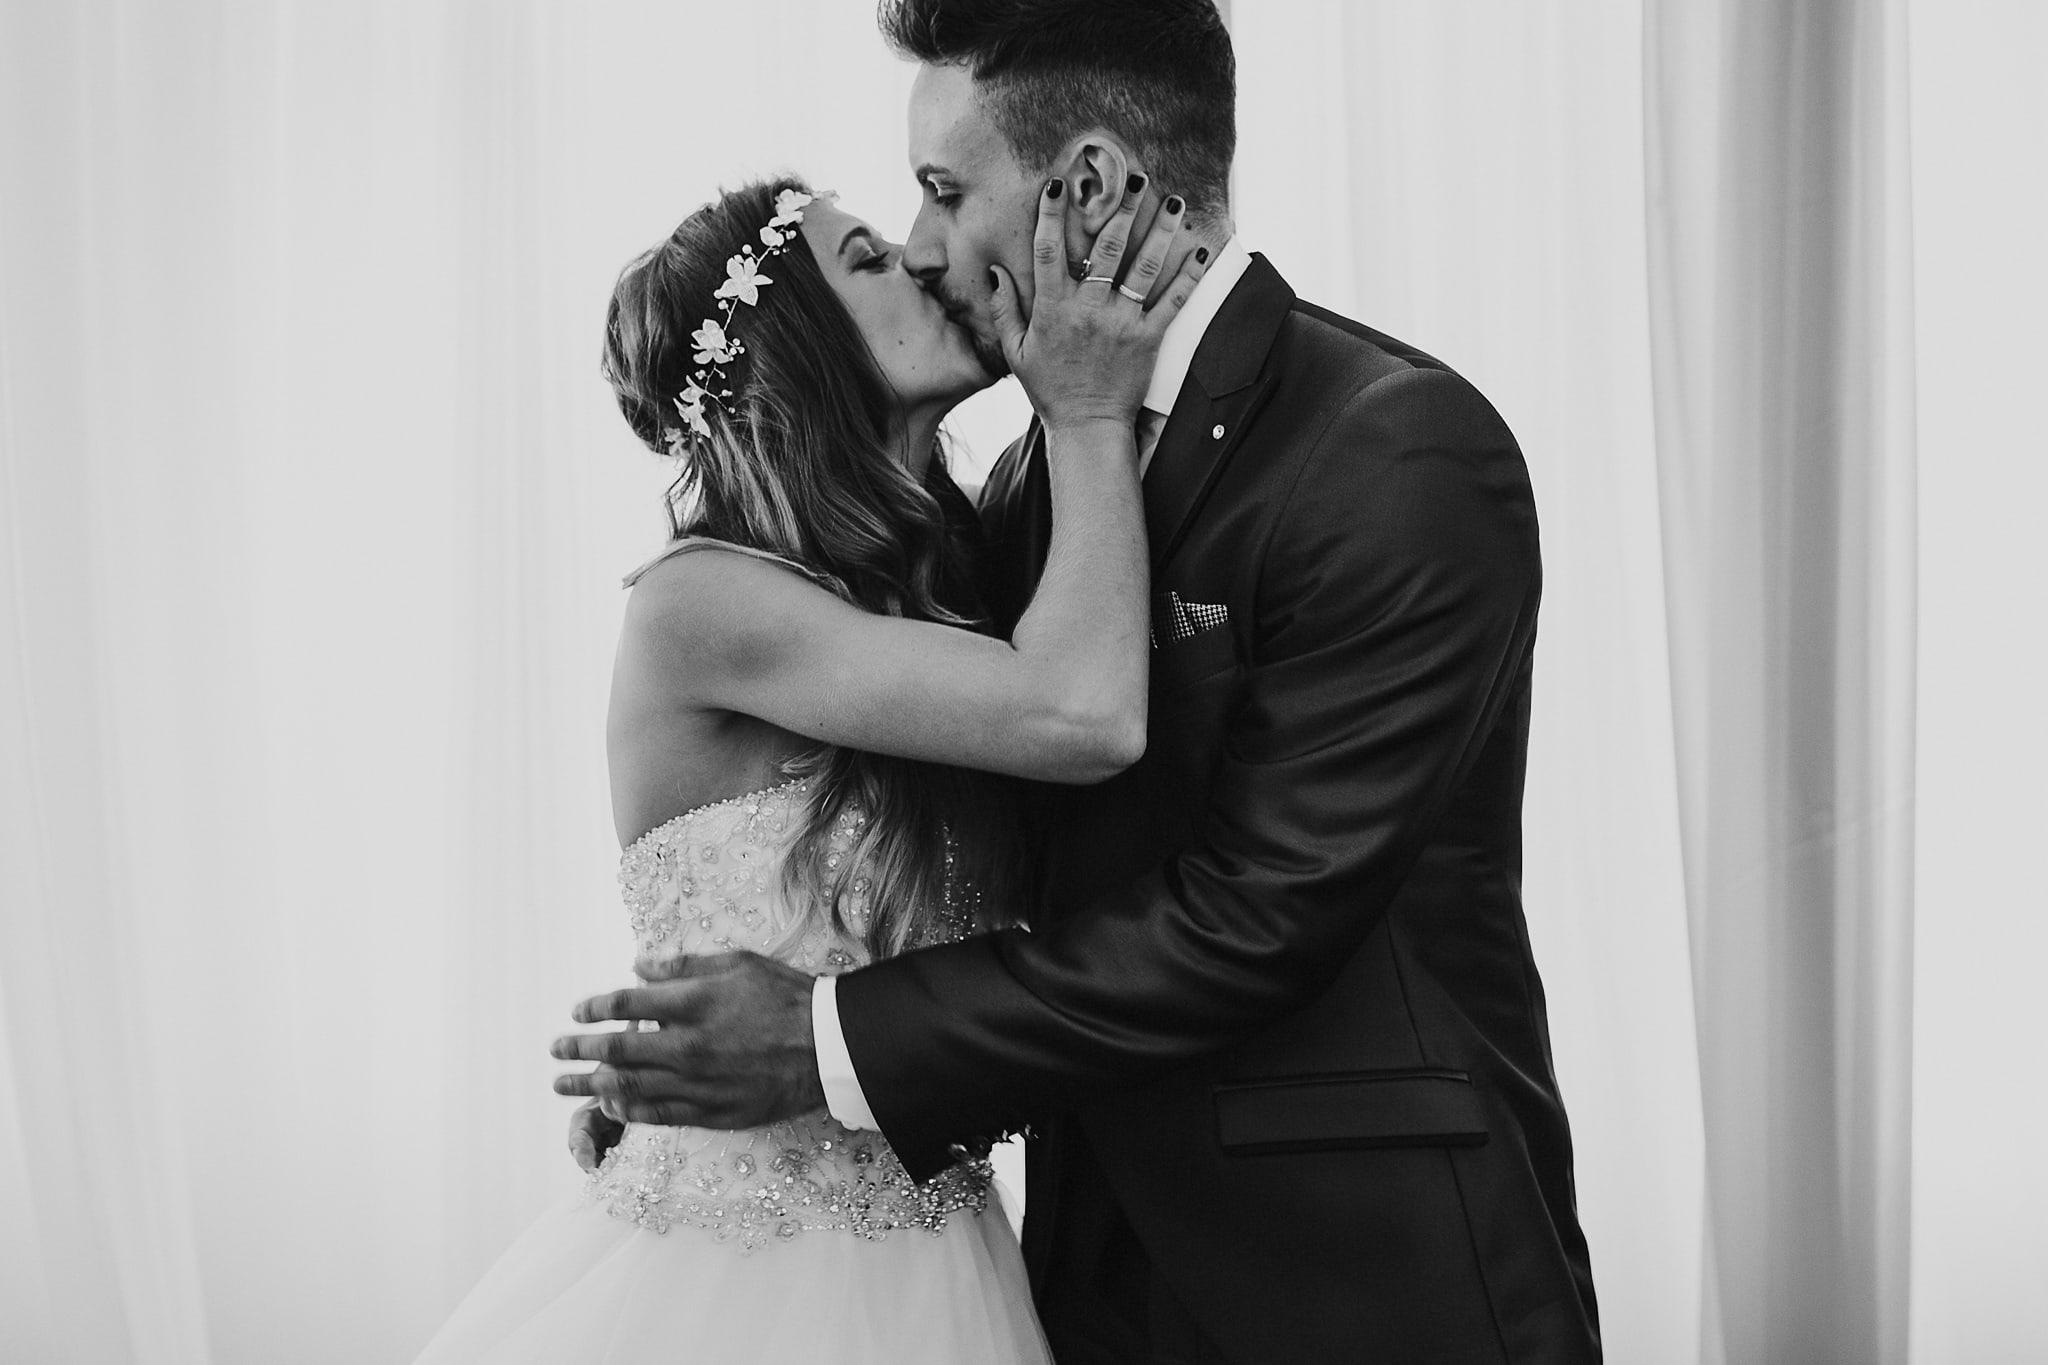 fotografo-bodas-altea-67a